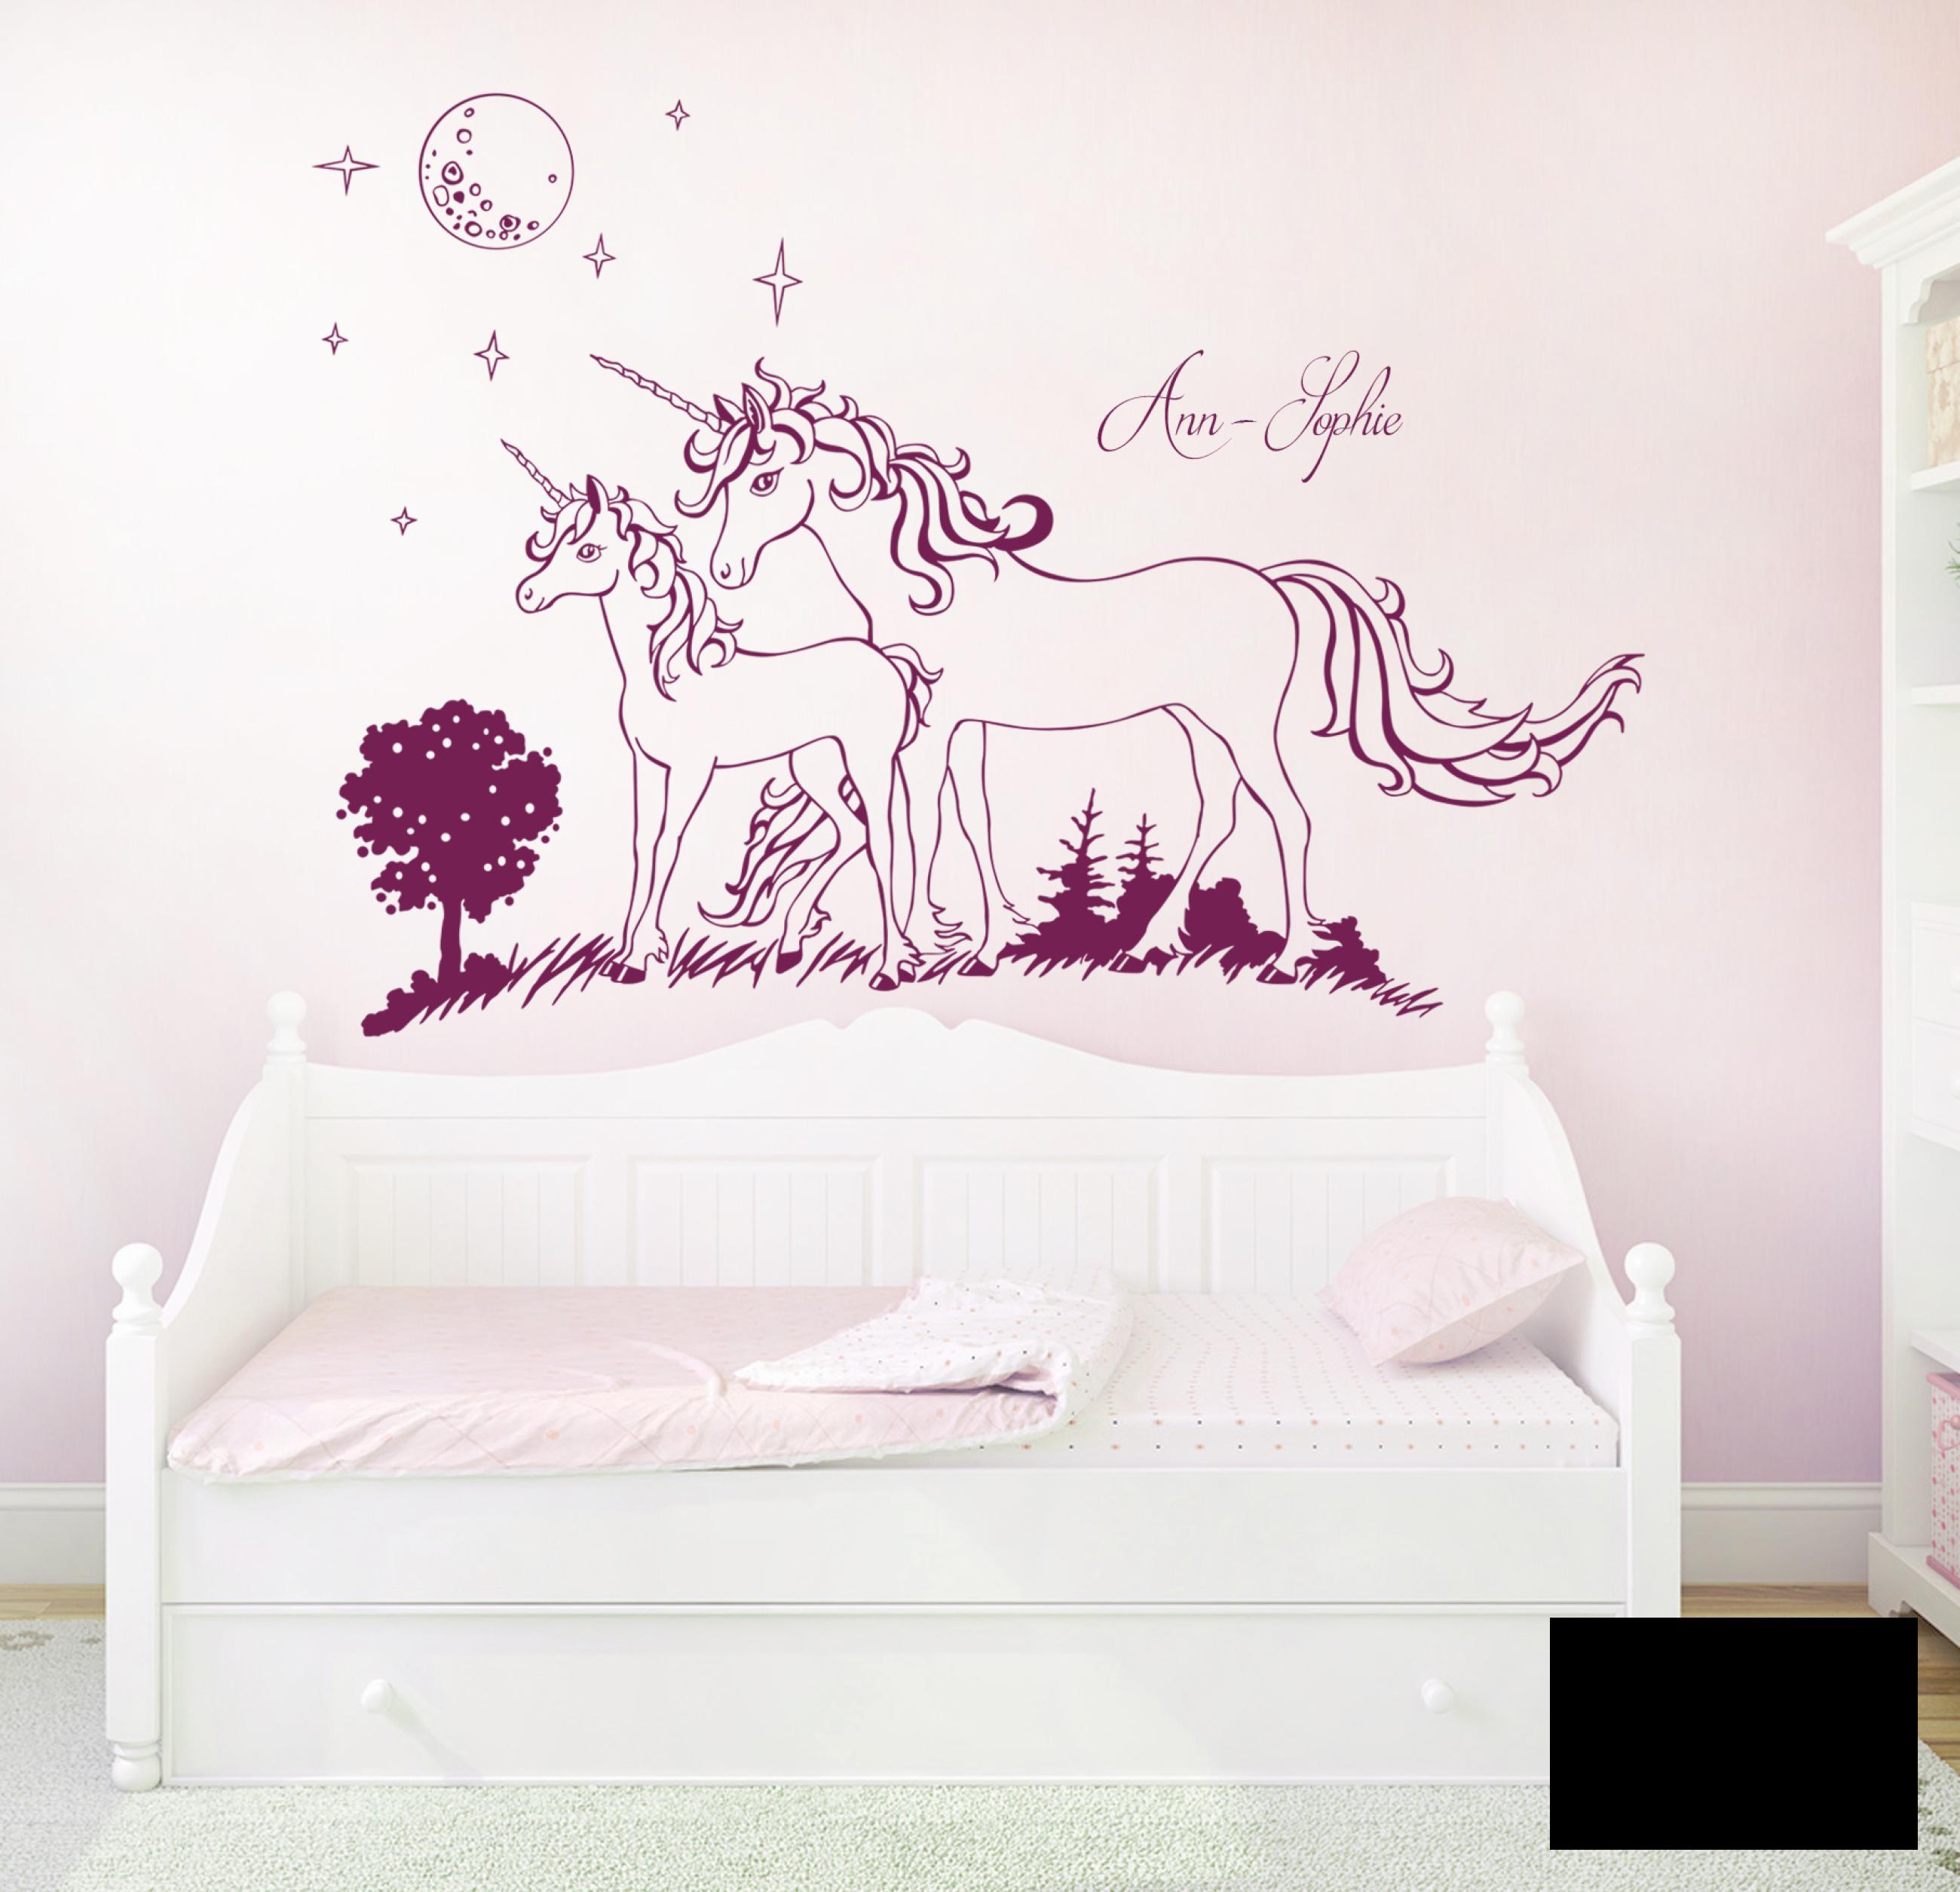 wandtattoo einh rner sterne mit namen m1600 ebay. Black Bedroom Furniture Sets. Home Design Ideas